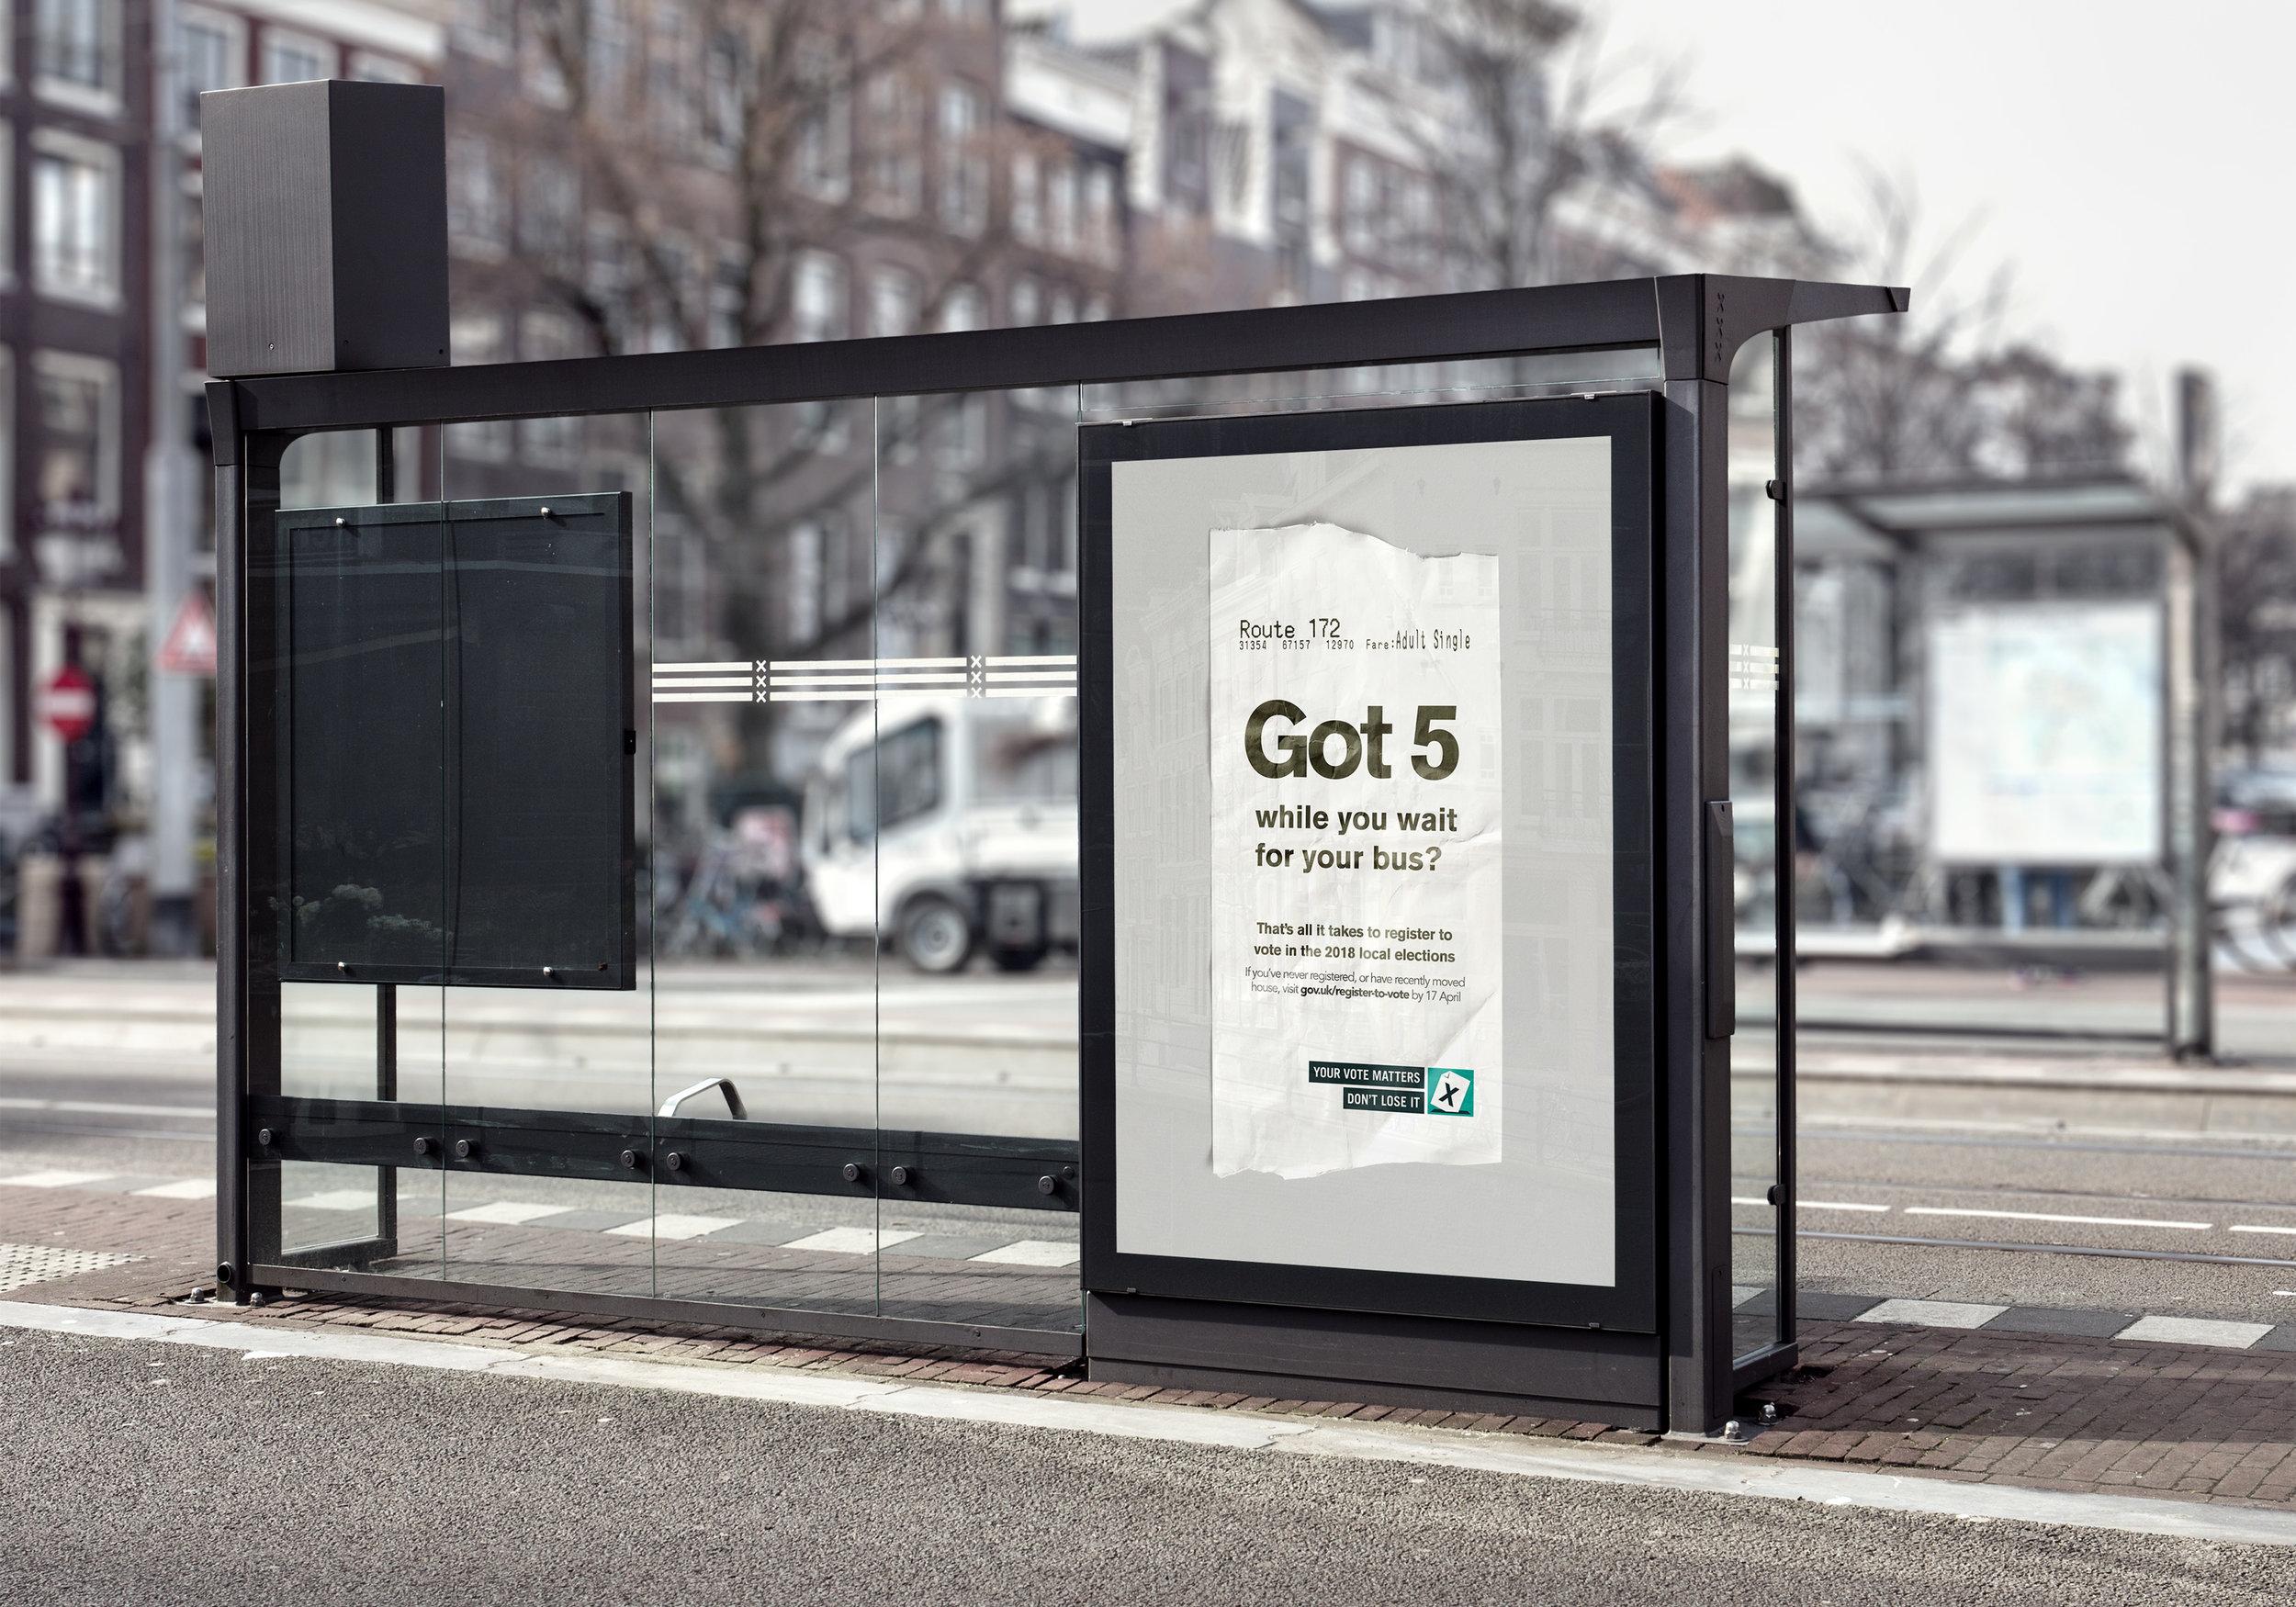 Got-5-Bus-Stop-in-situe.jpg